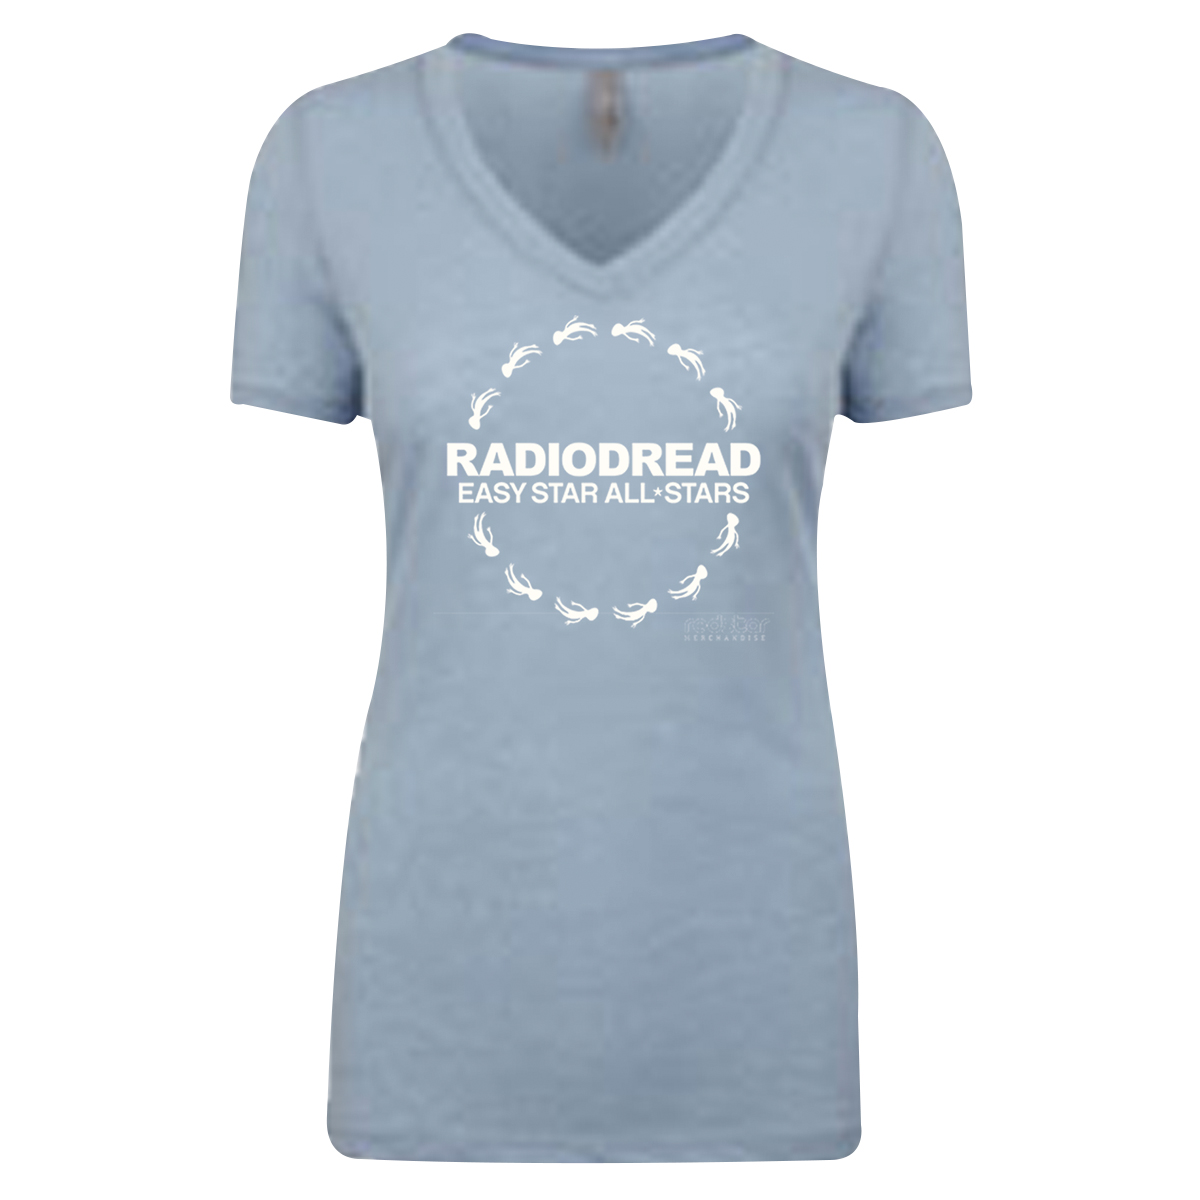 Radiodread Women's T-Shirt